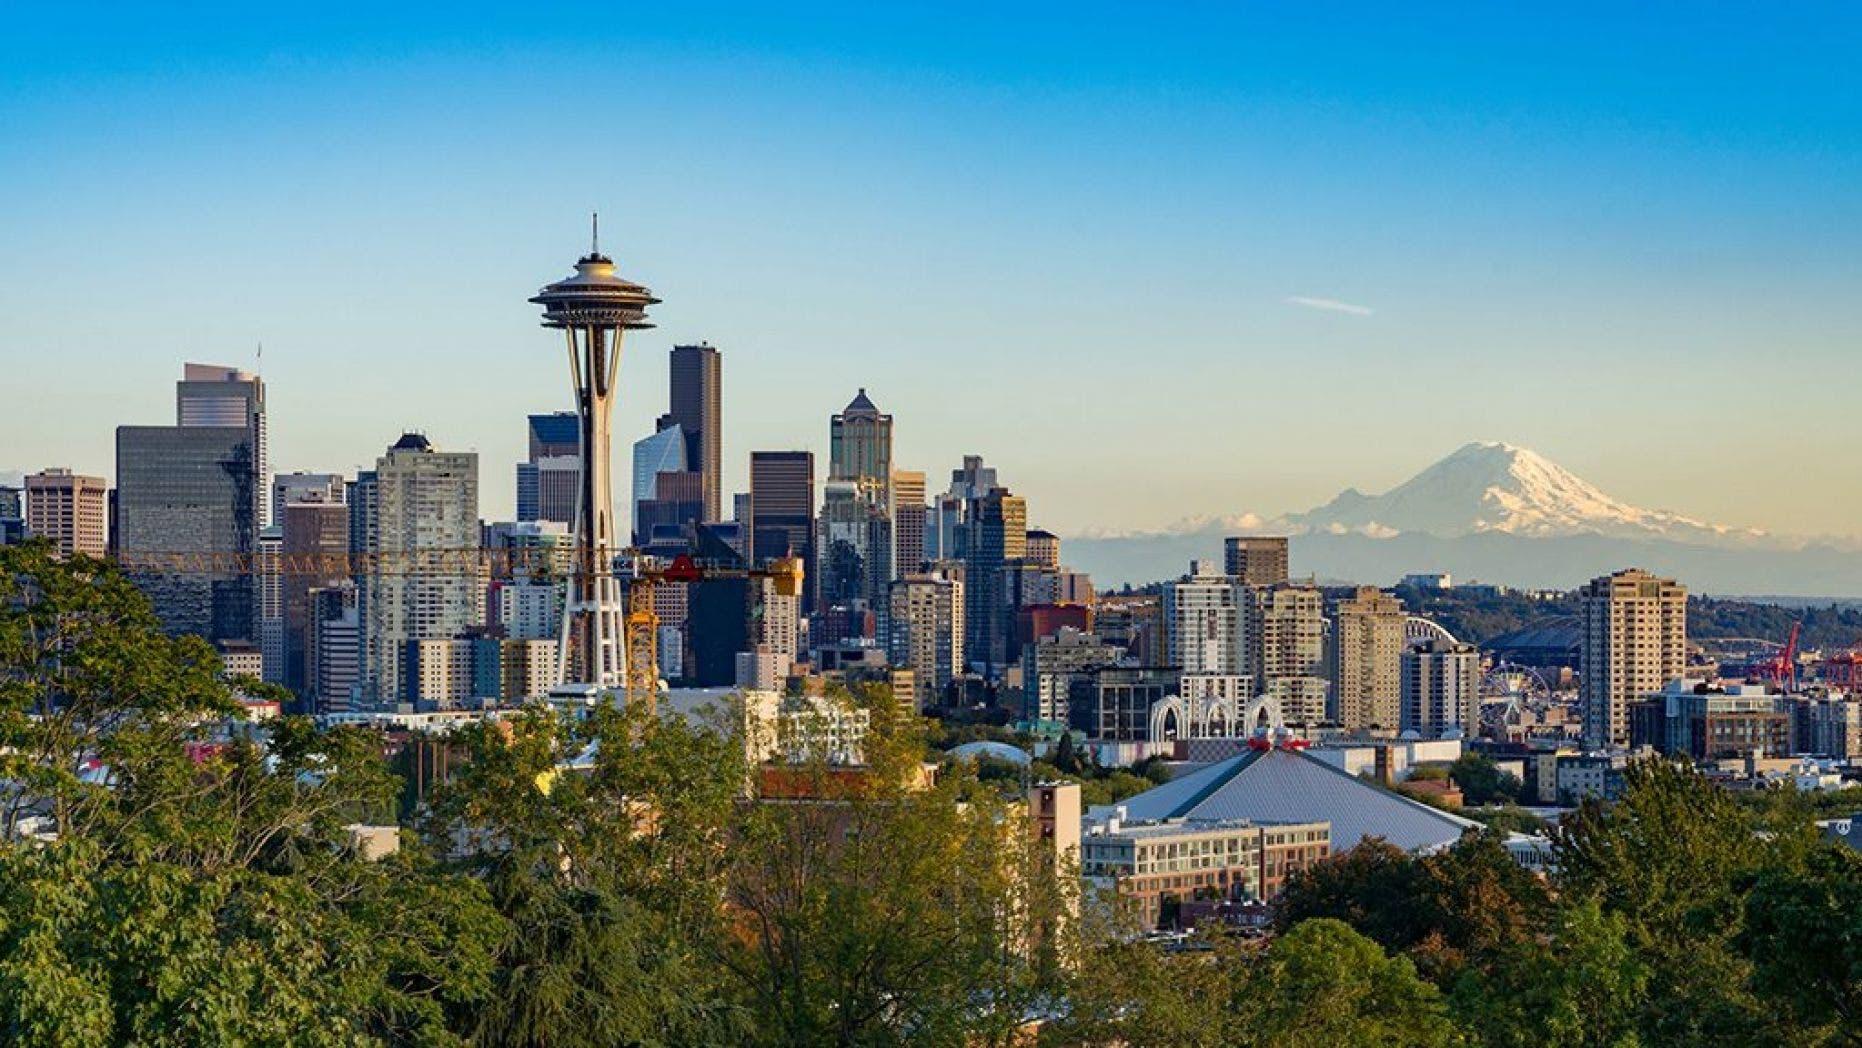 Microsoft is spending $500 million on housing in Seattle.